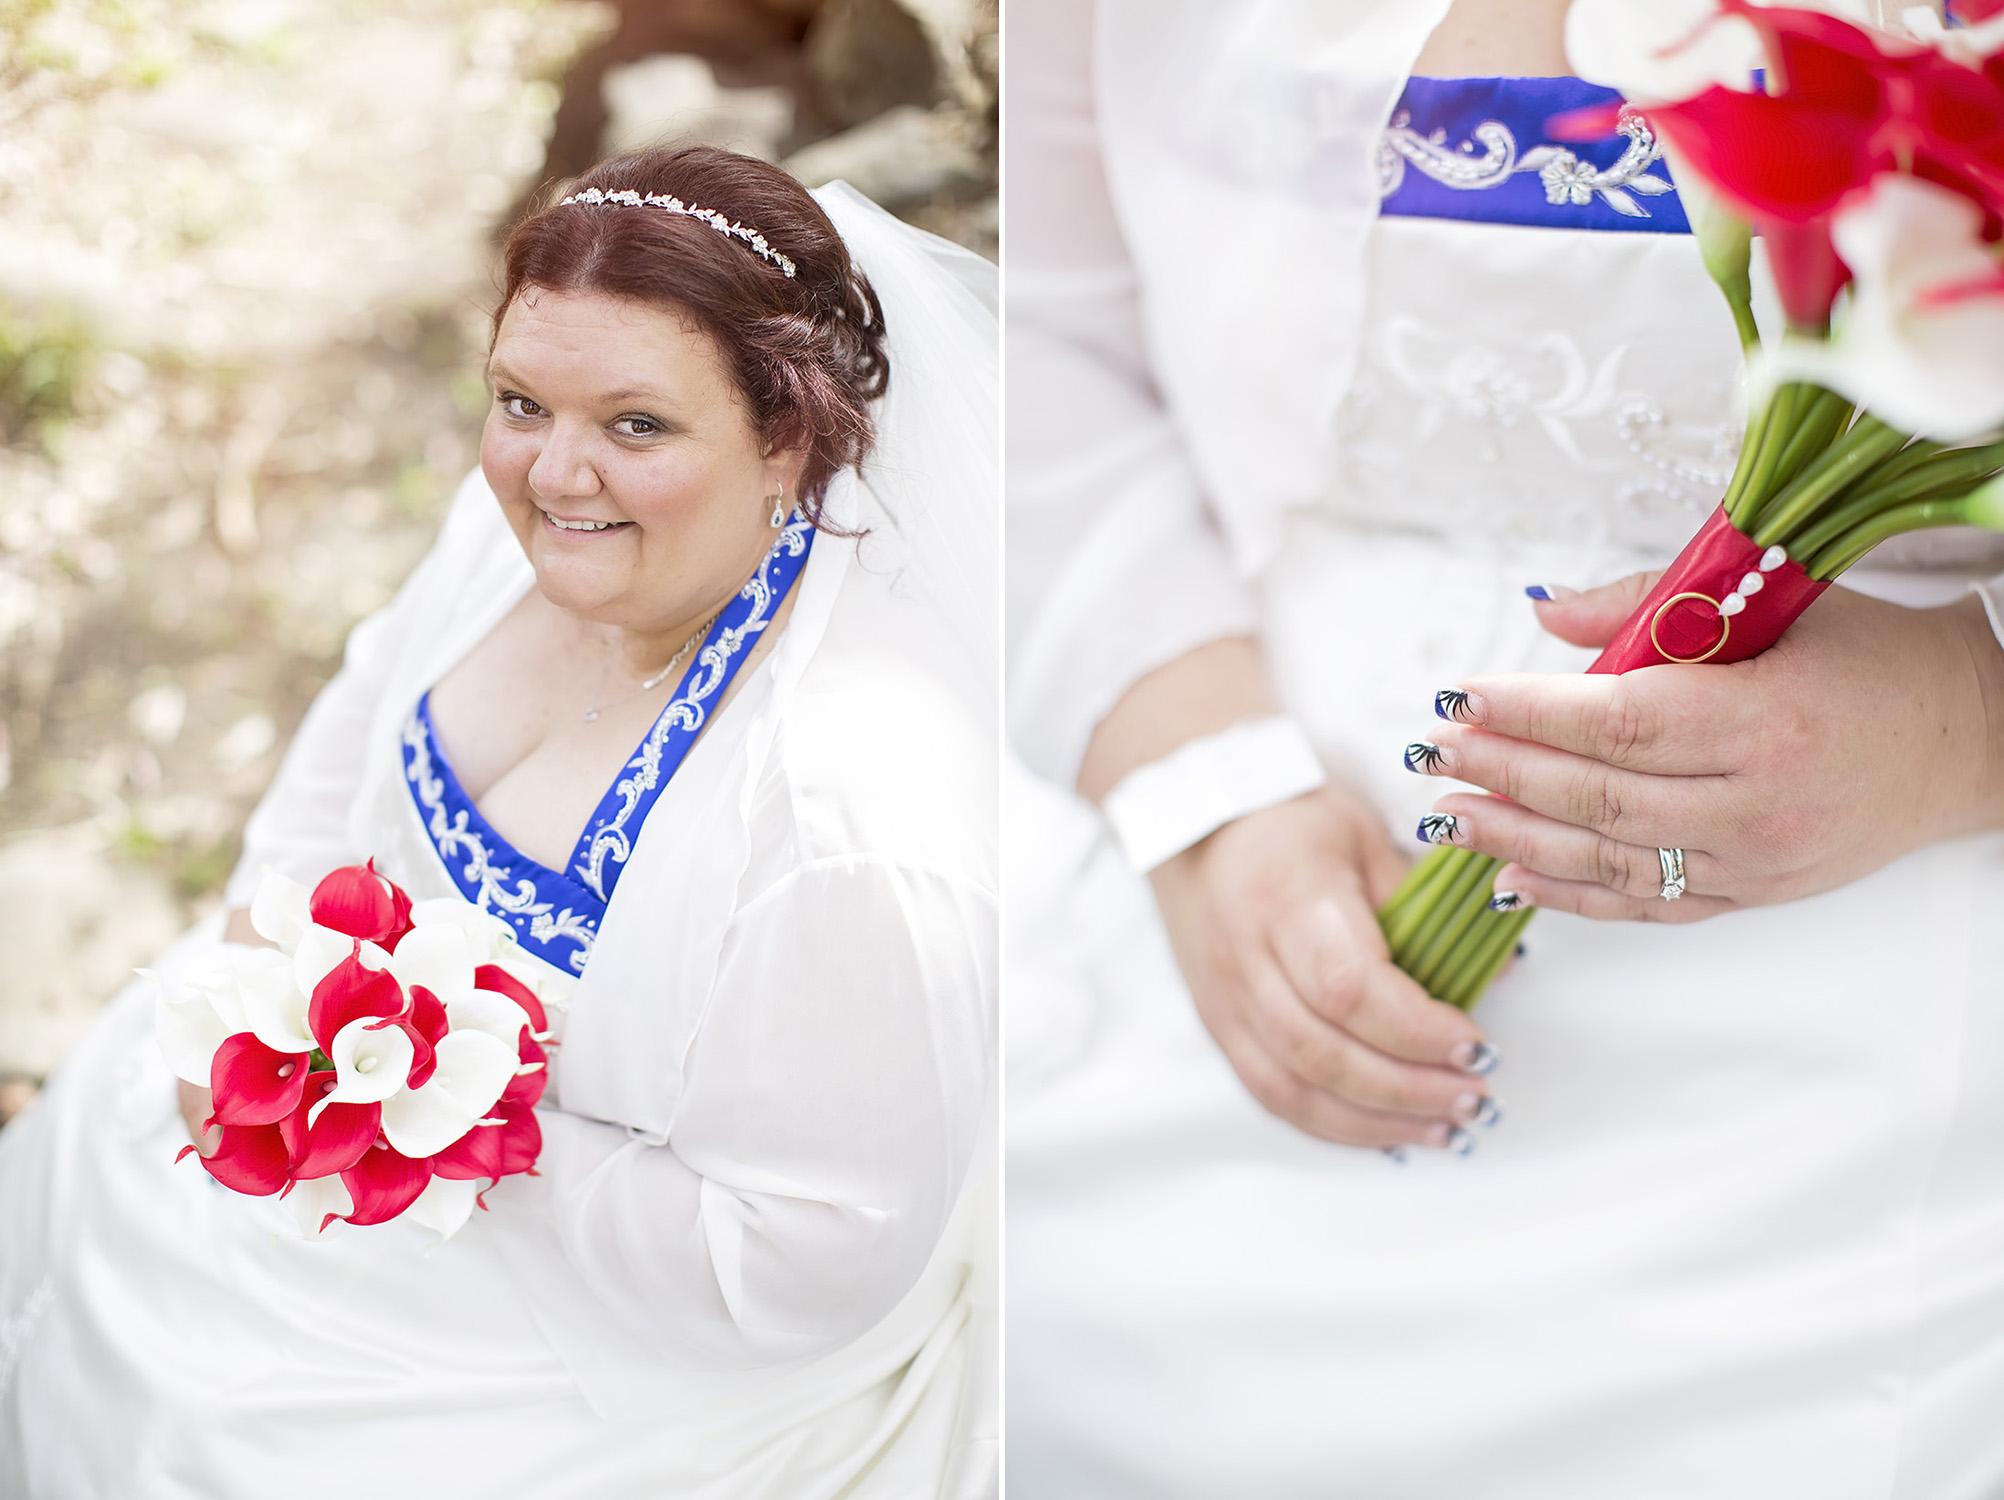 Sferas Modbury wedding 22.jpg